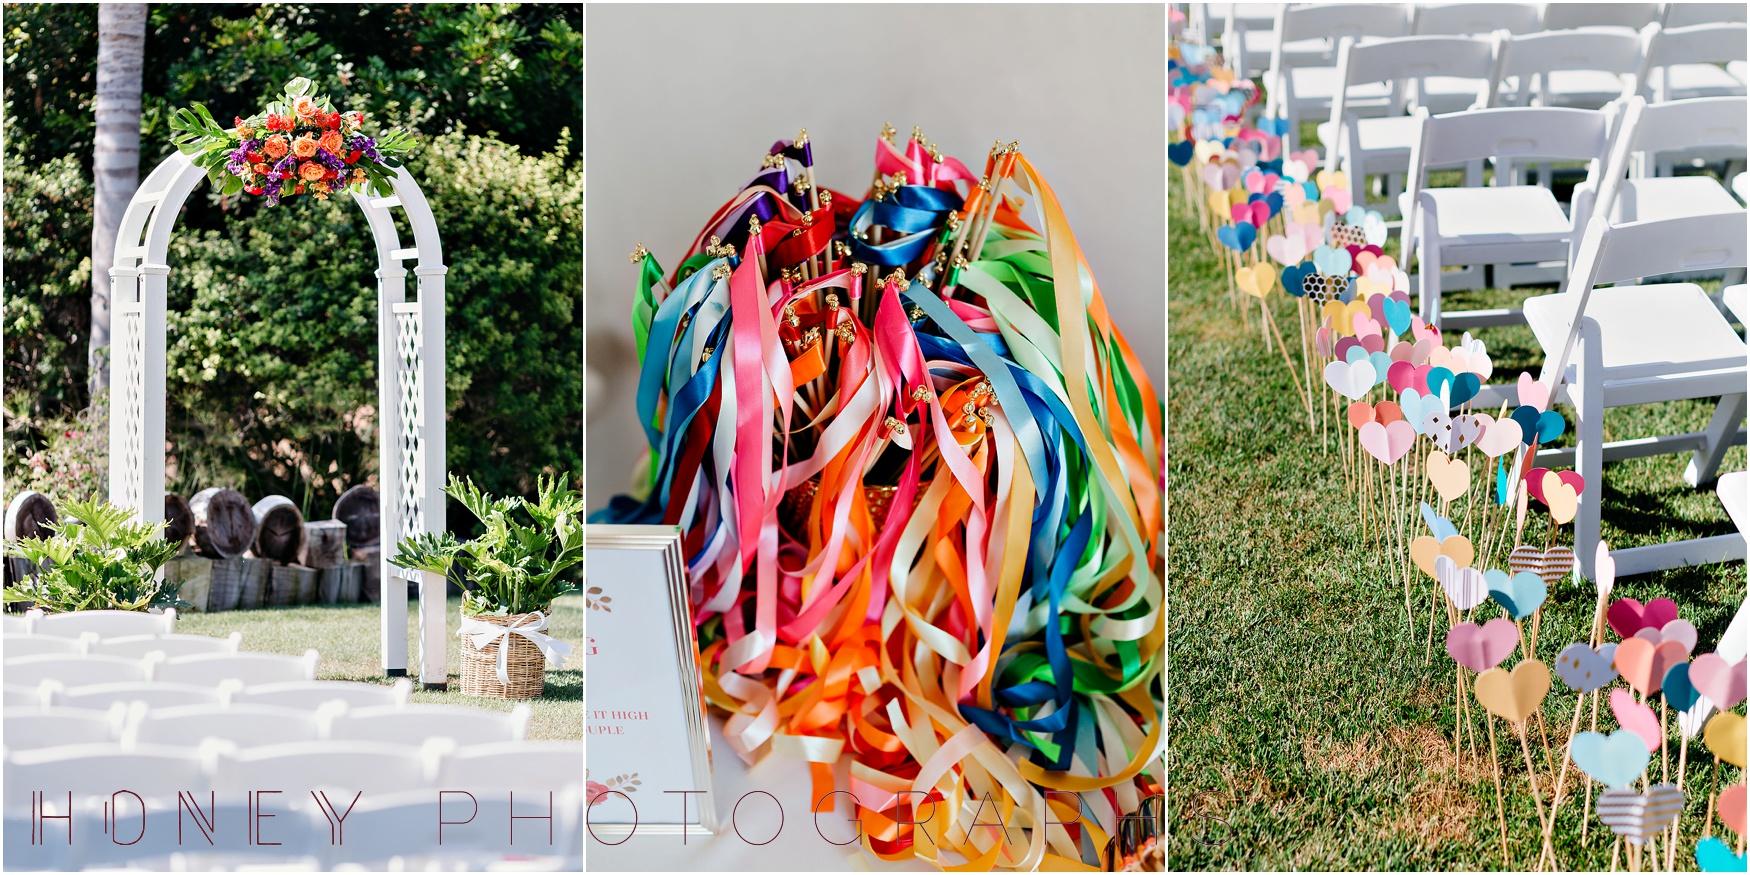 colorful_ecclectic_vibrant_vista_rainbow_quirky_wedding012.jpg